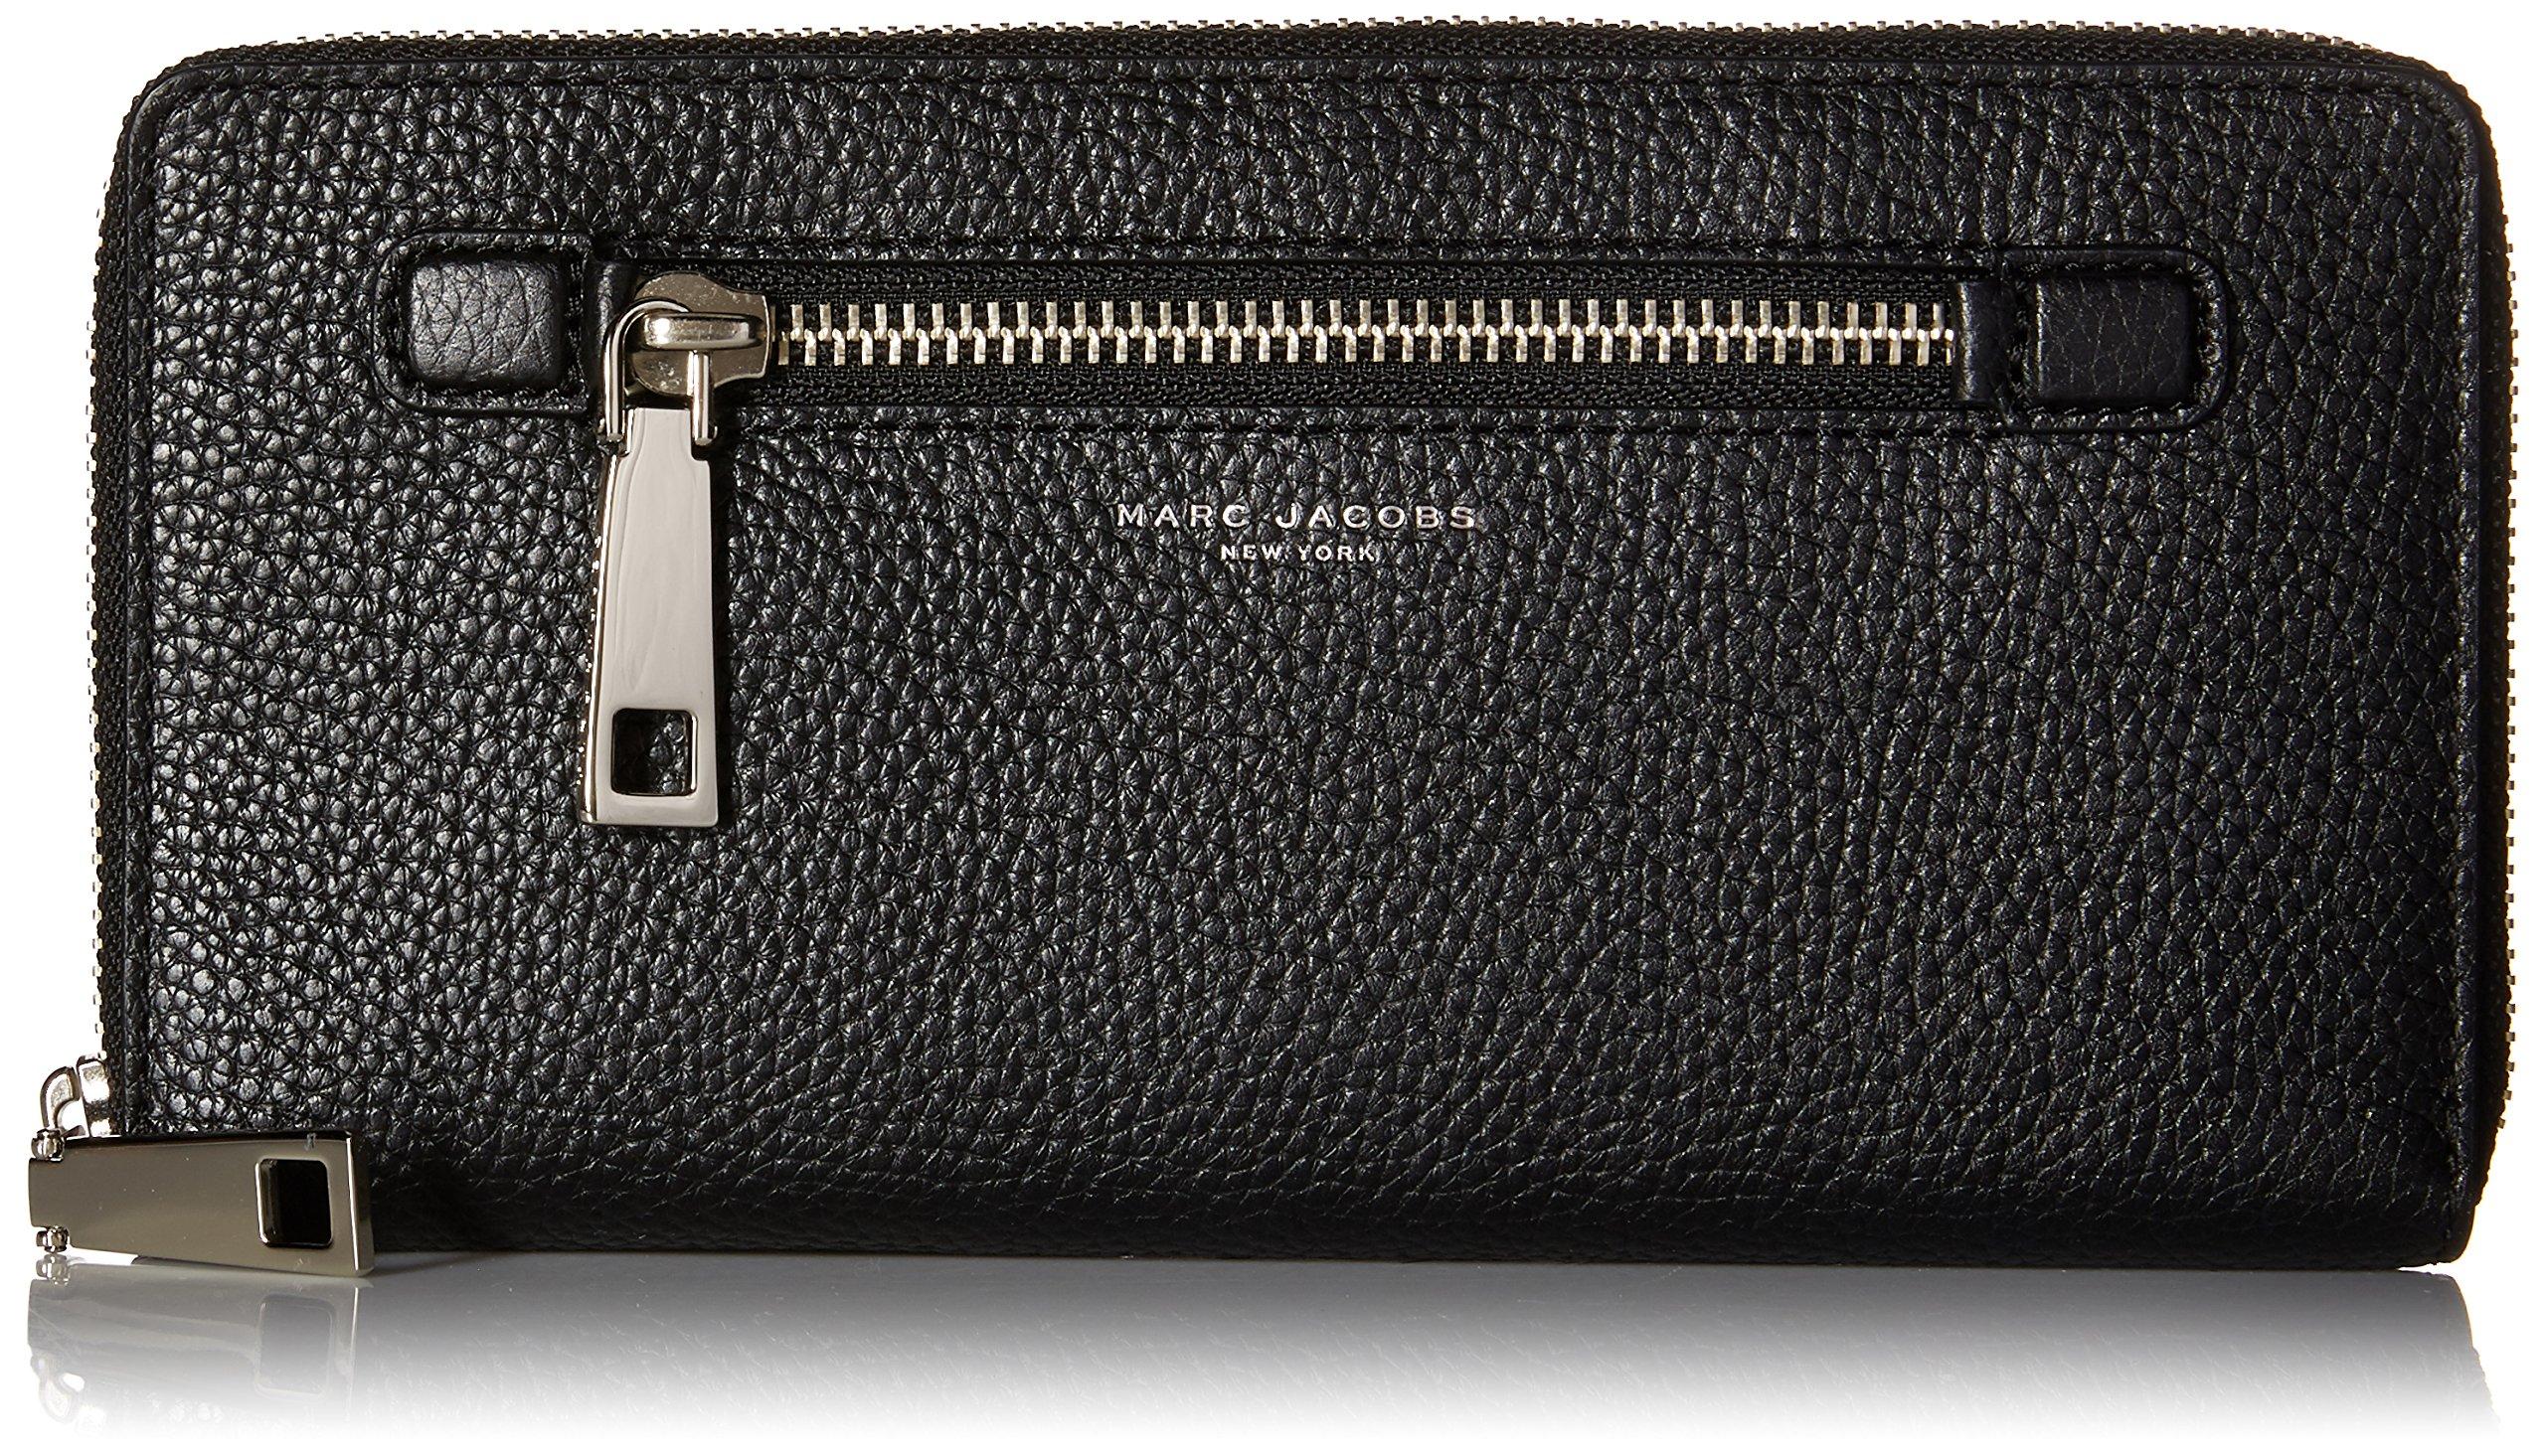 Marc Jacobs Gotham City Slgs Travel Wallet, Black, One Size